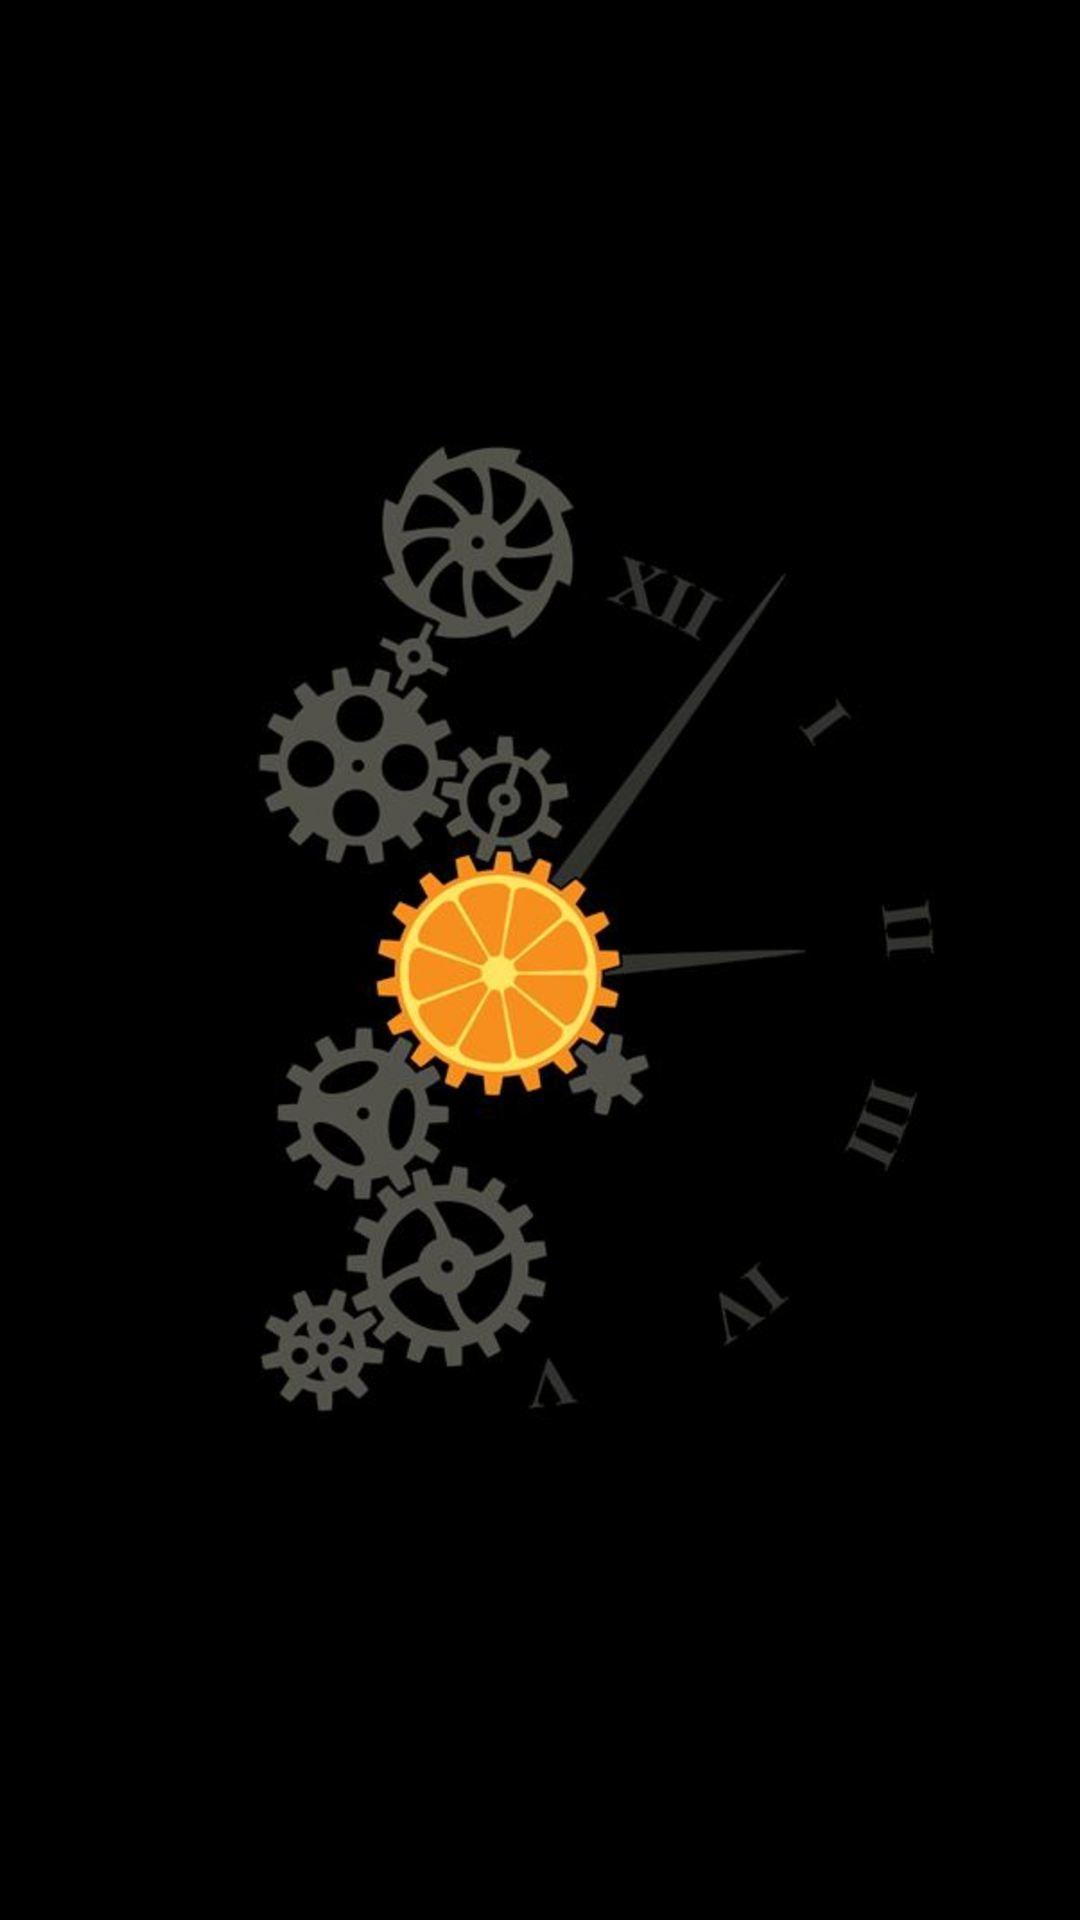 Clock Minimalism Image Wallpaper – [1080×1920] 4K